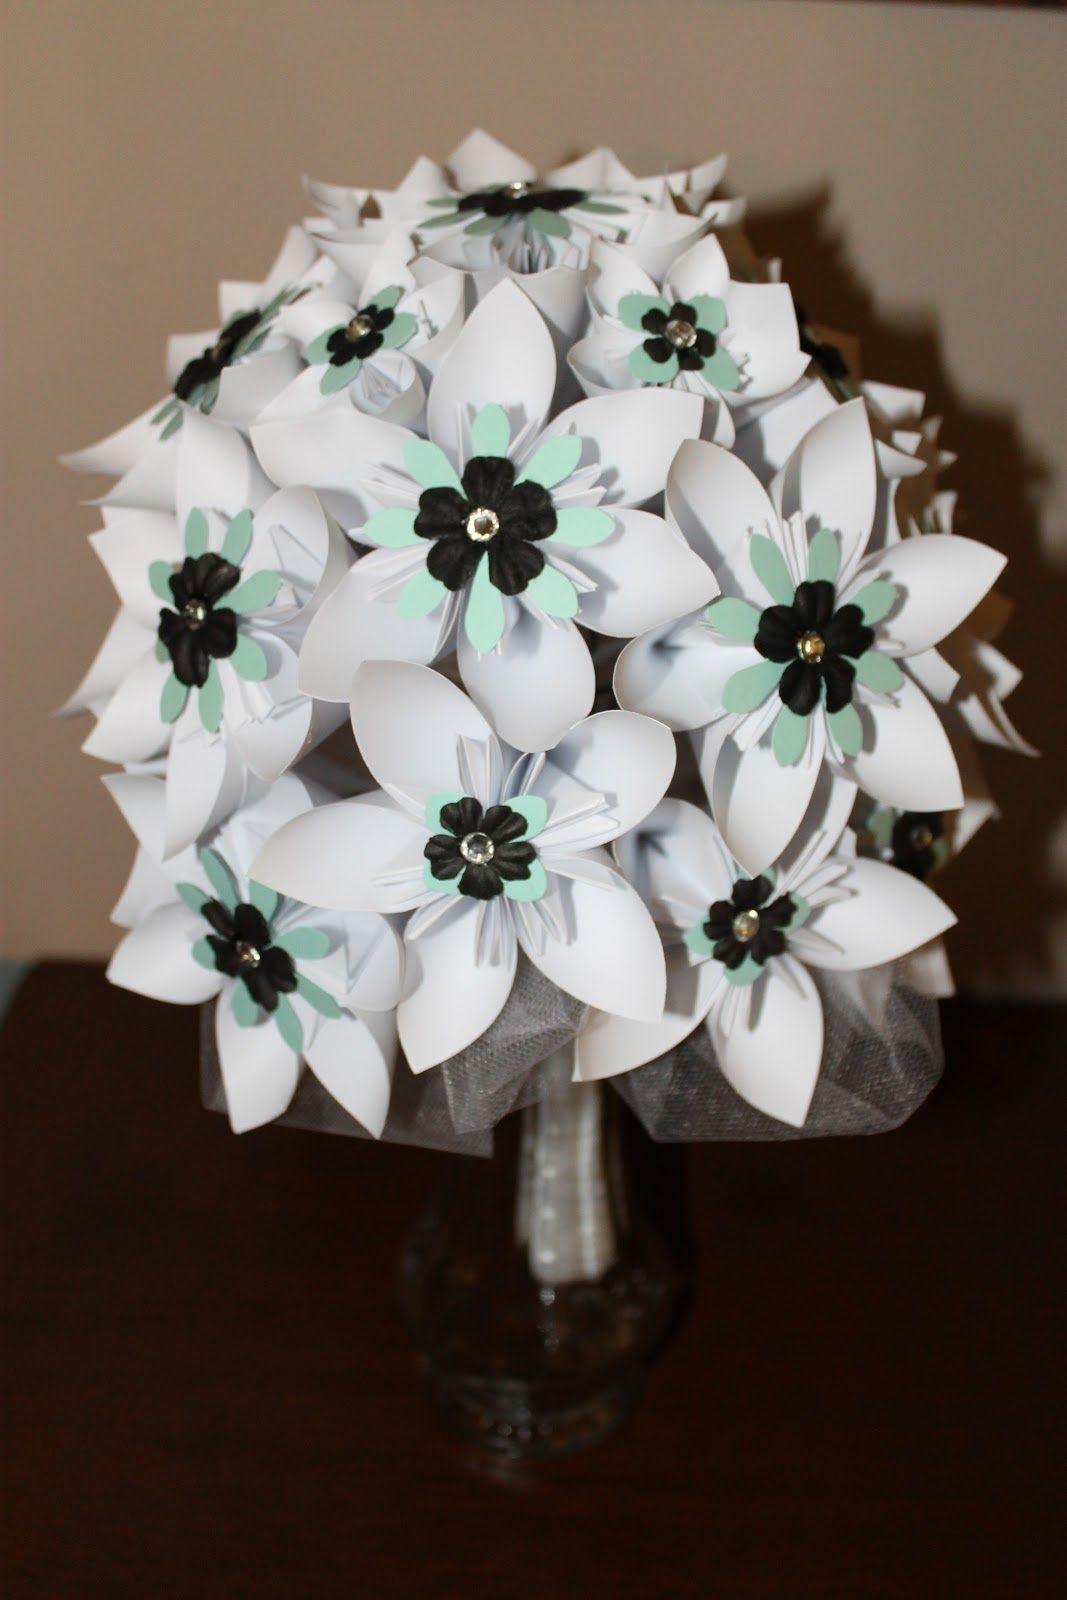 Mint black white origami bouquet cutesy pinterest origami mint black white origami bouquet origami bouquetorigami flowersorigami weddingflower mightylinksfo